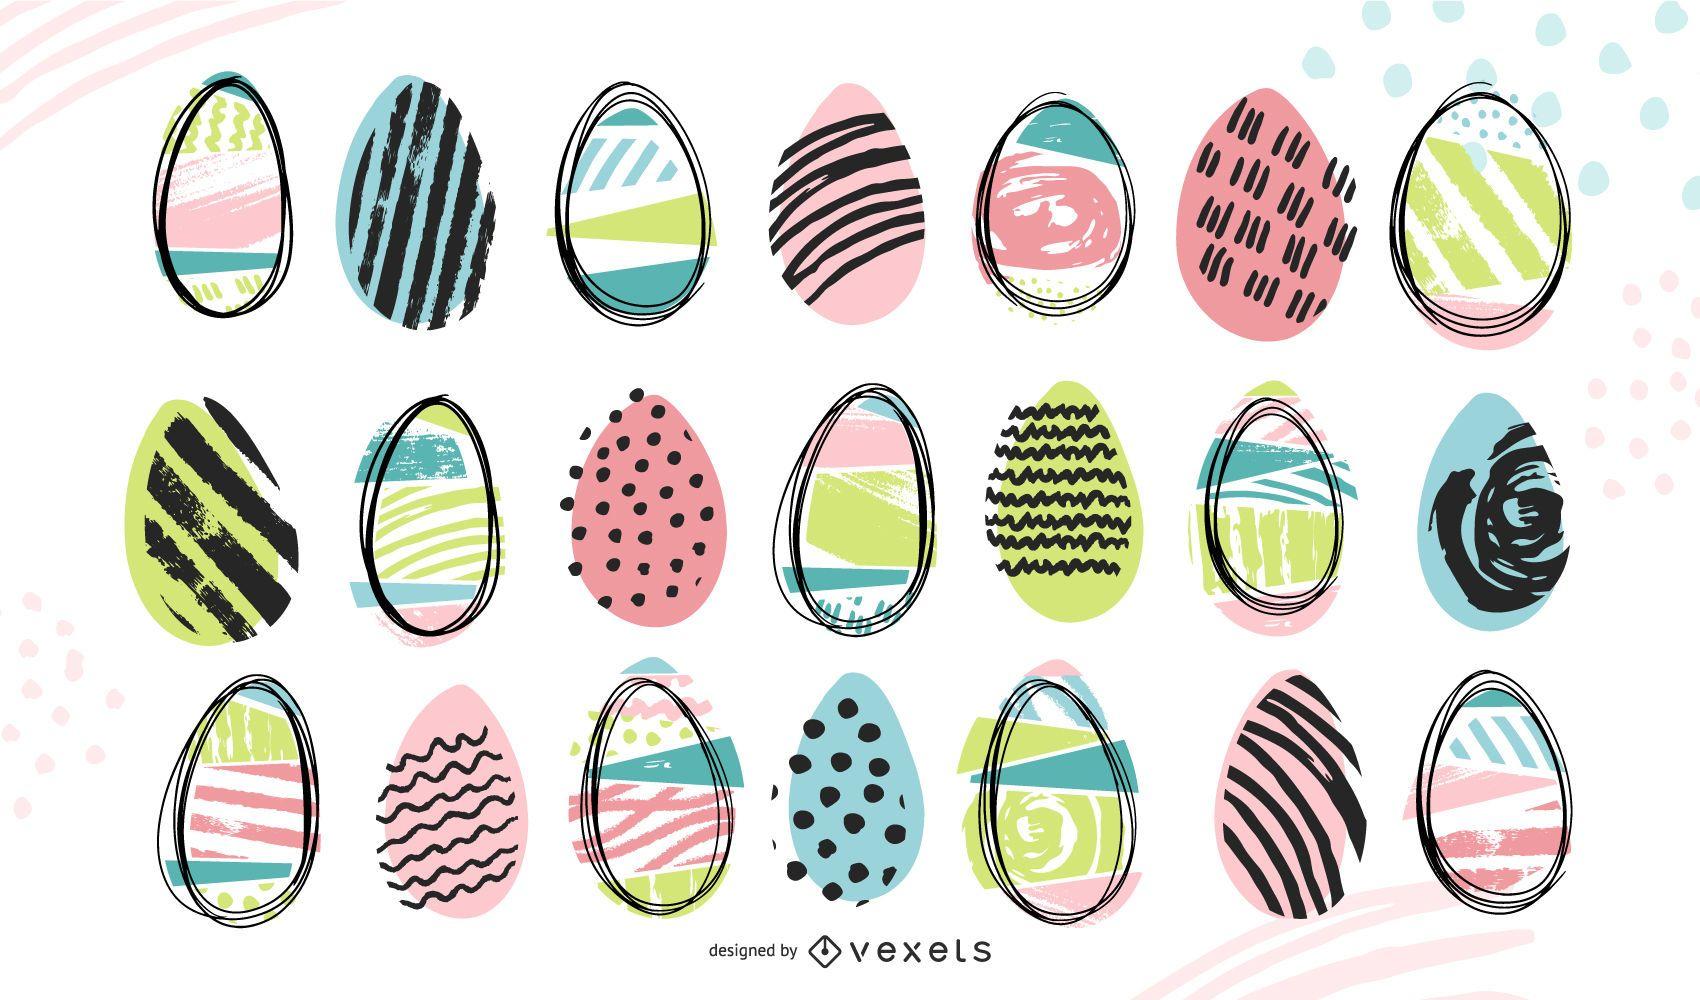 Colección de huevos de pascua de doodle